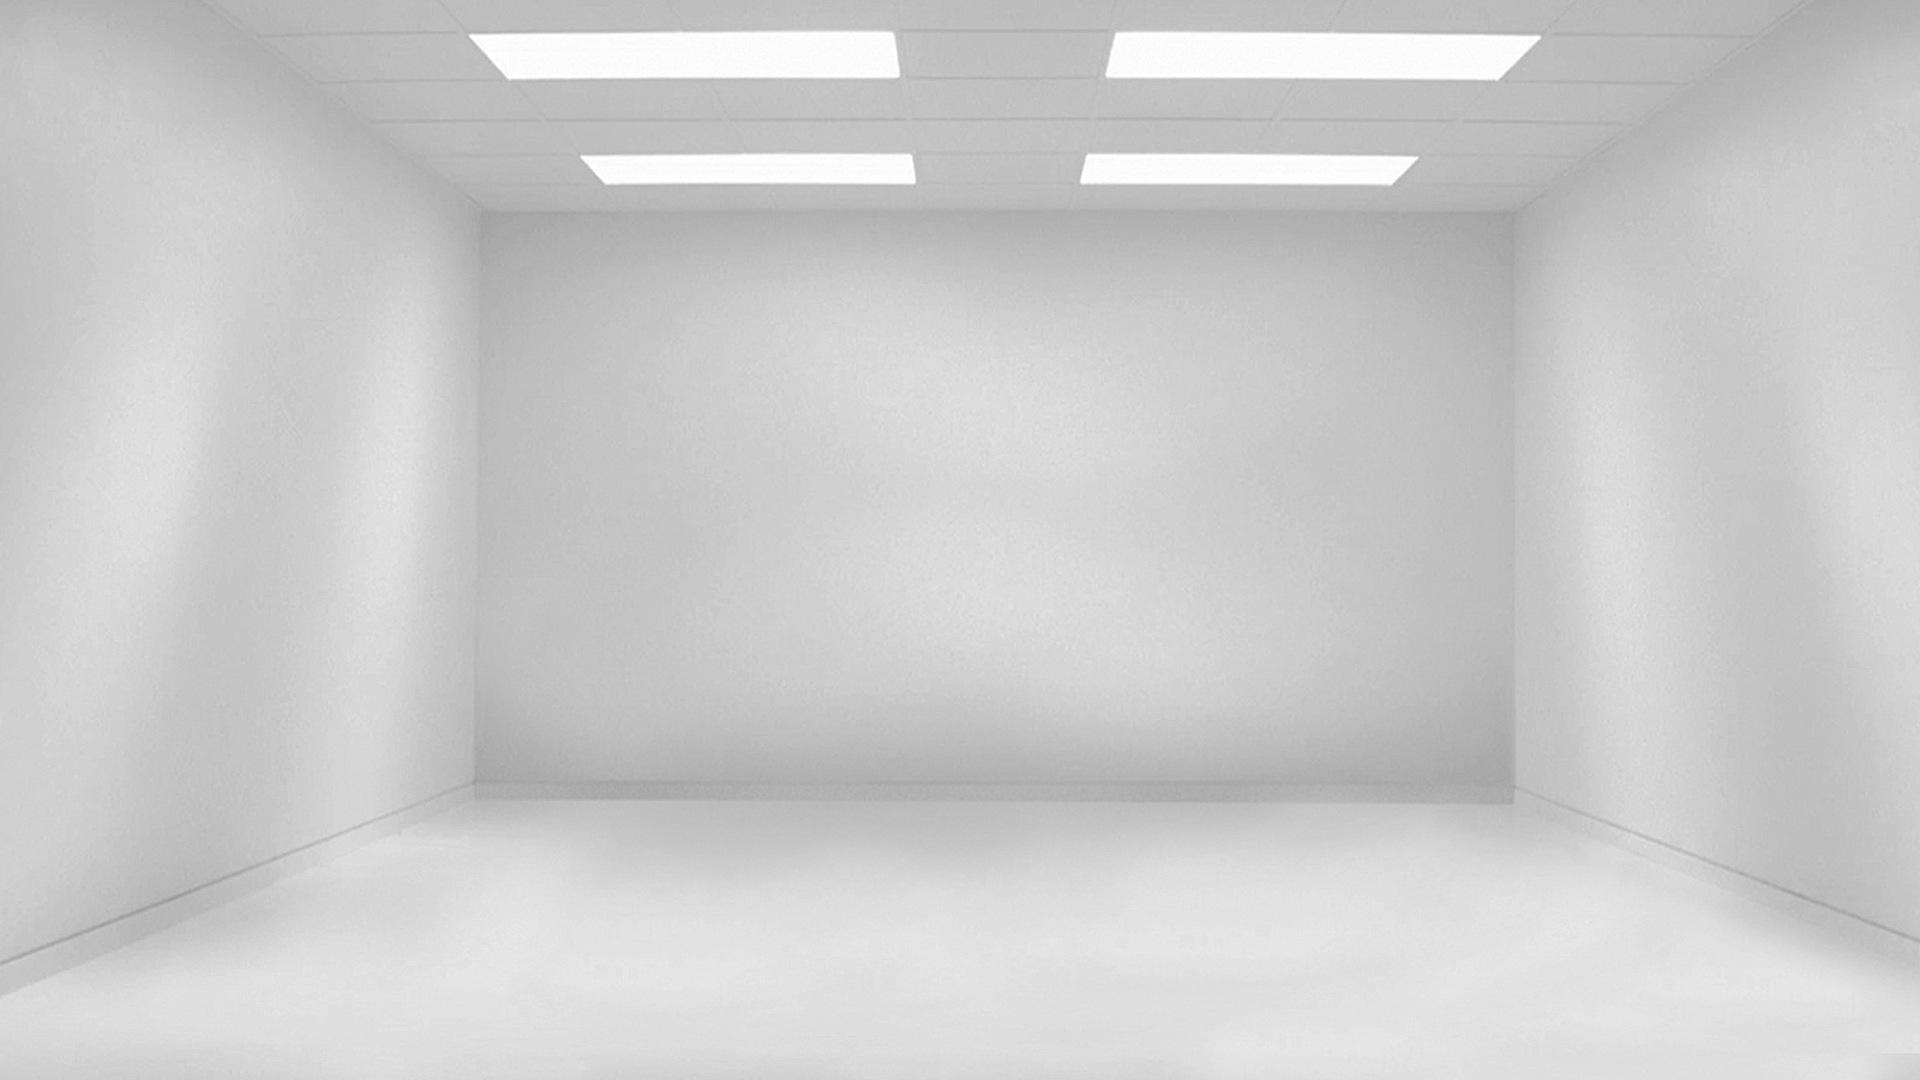 white white room wallpaper 1920x1080 75327 wallpaperup